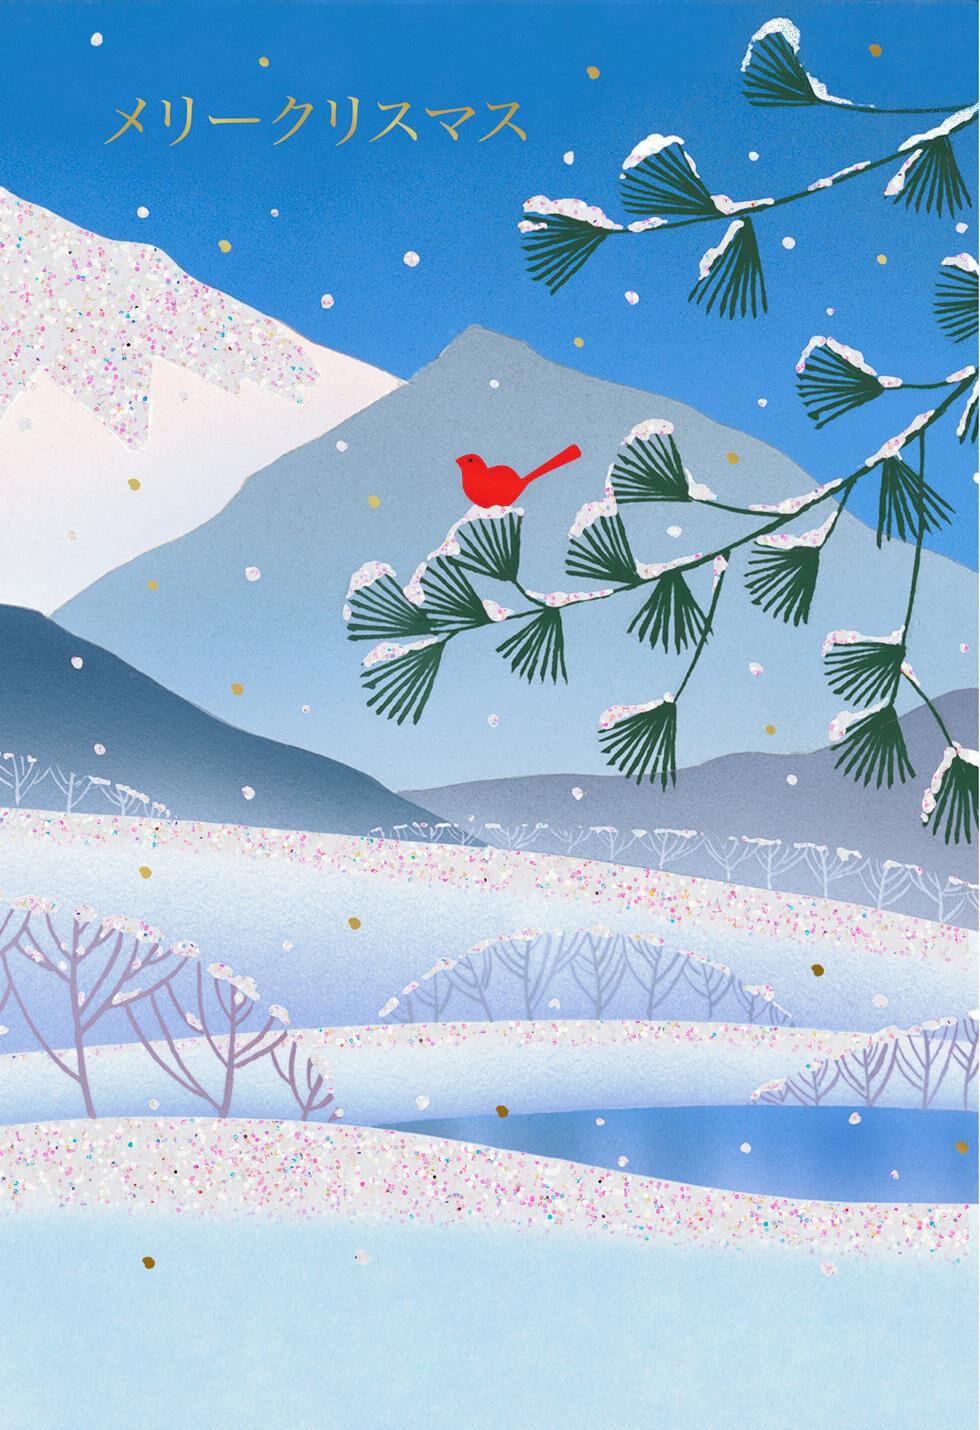 Snowy Mountains Japanese Language Christmas Card